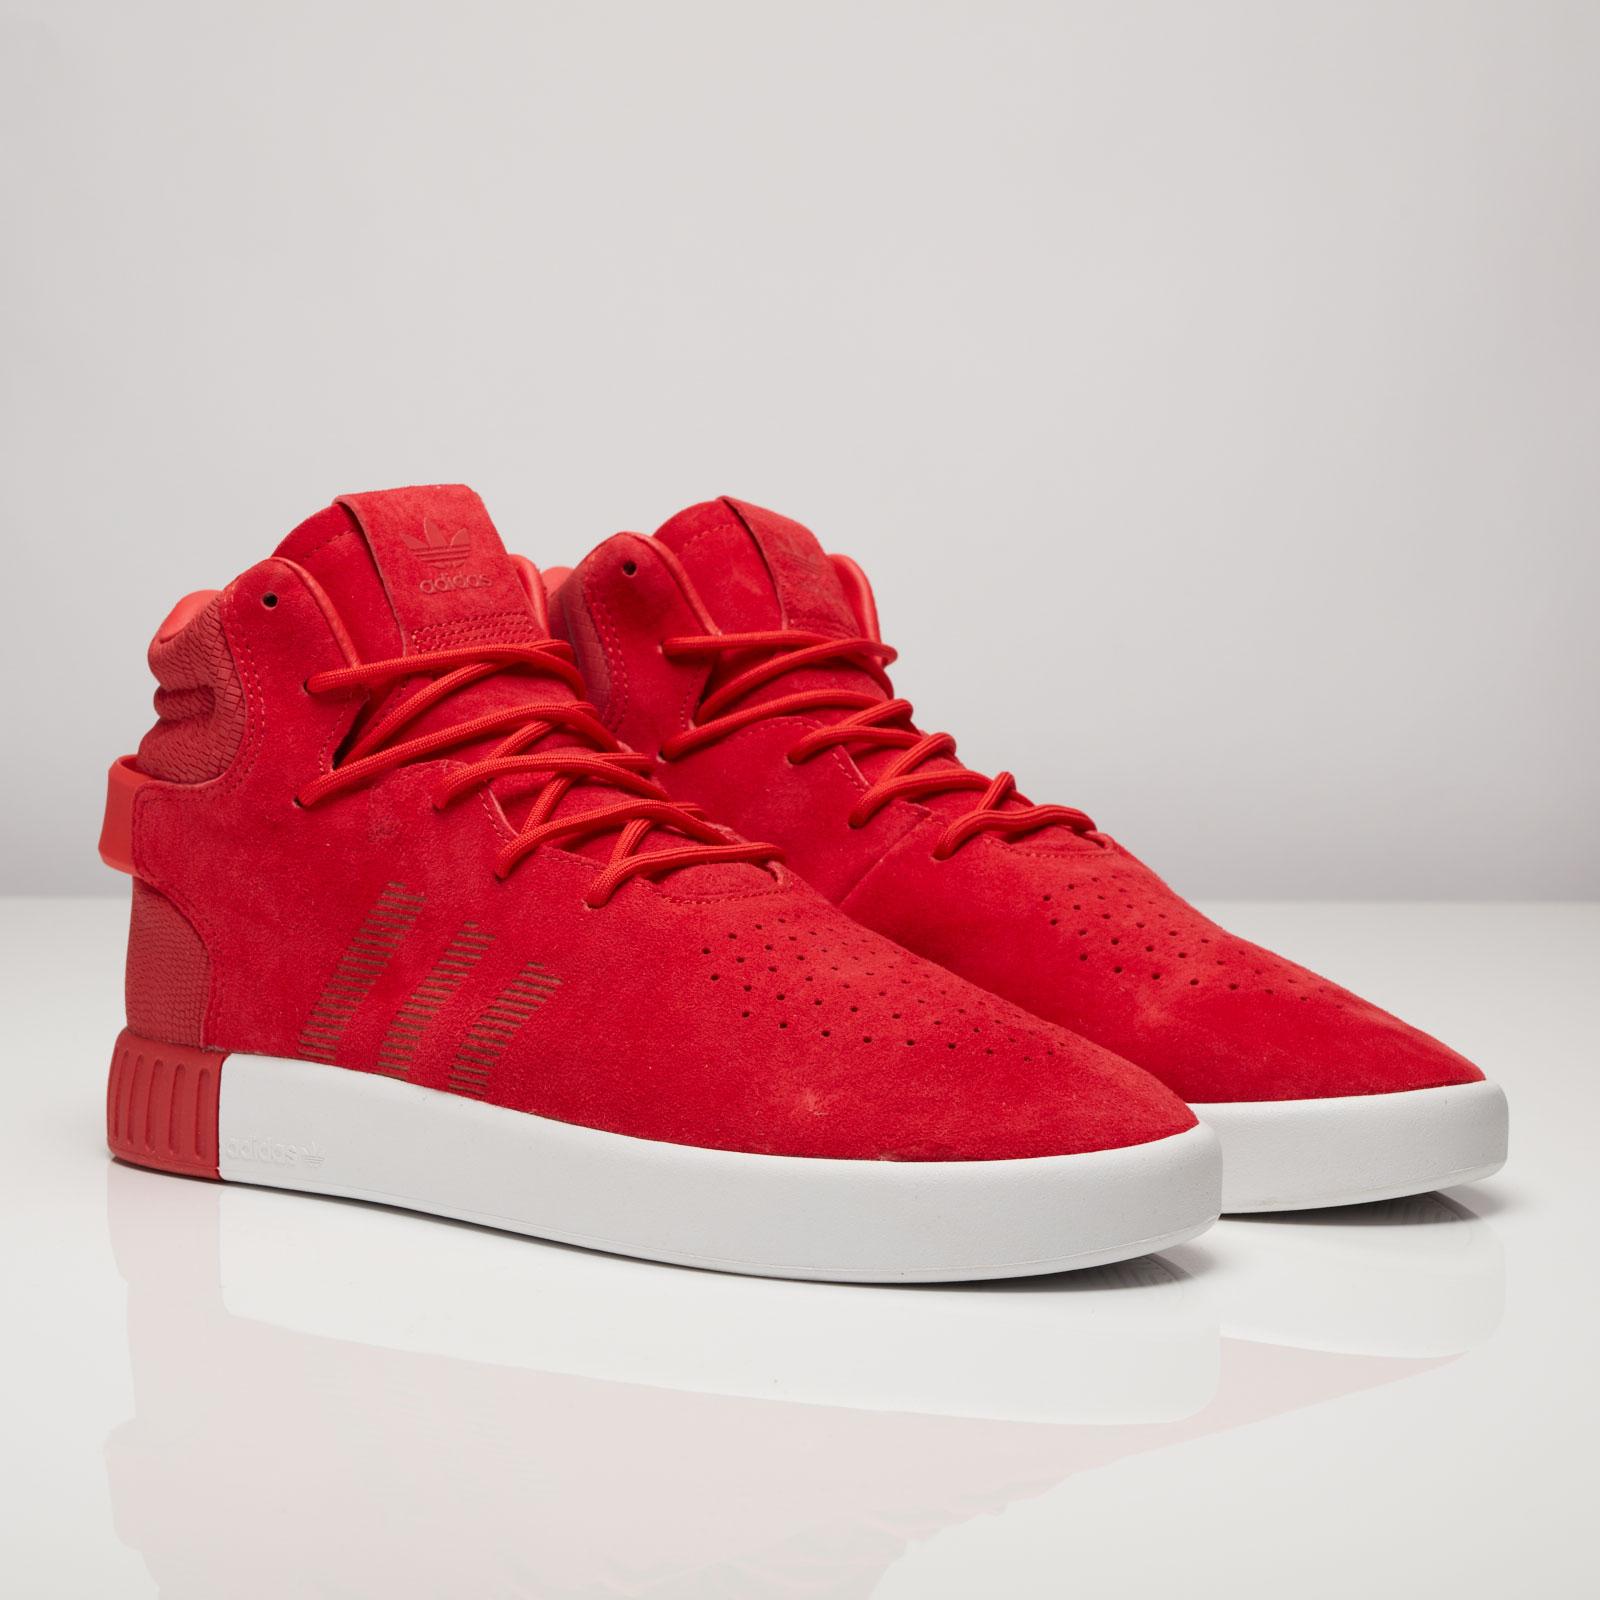 1427f54a770204 adidas Tubular Invader - S81963 - Sneakersnstuff